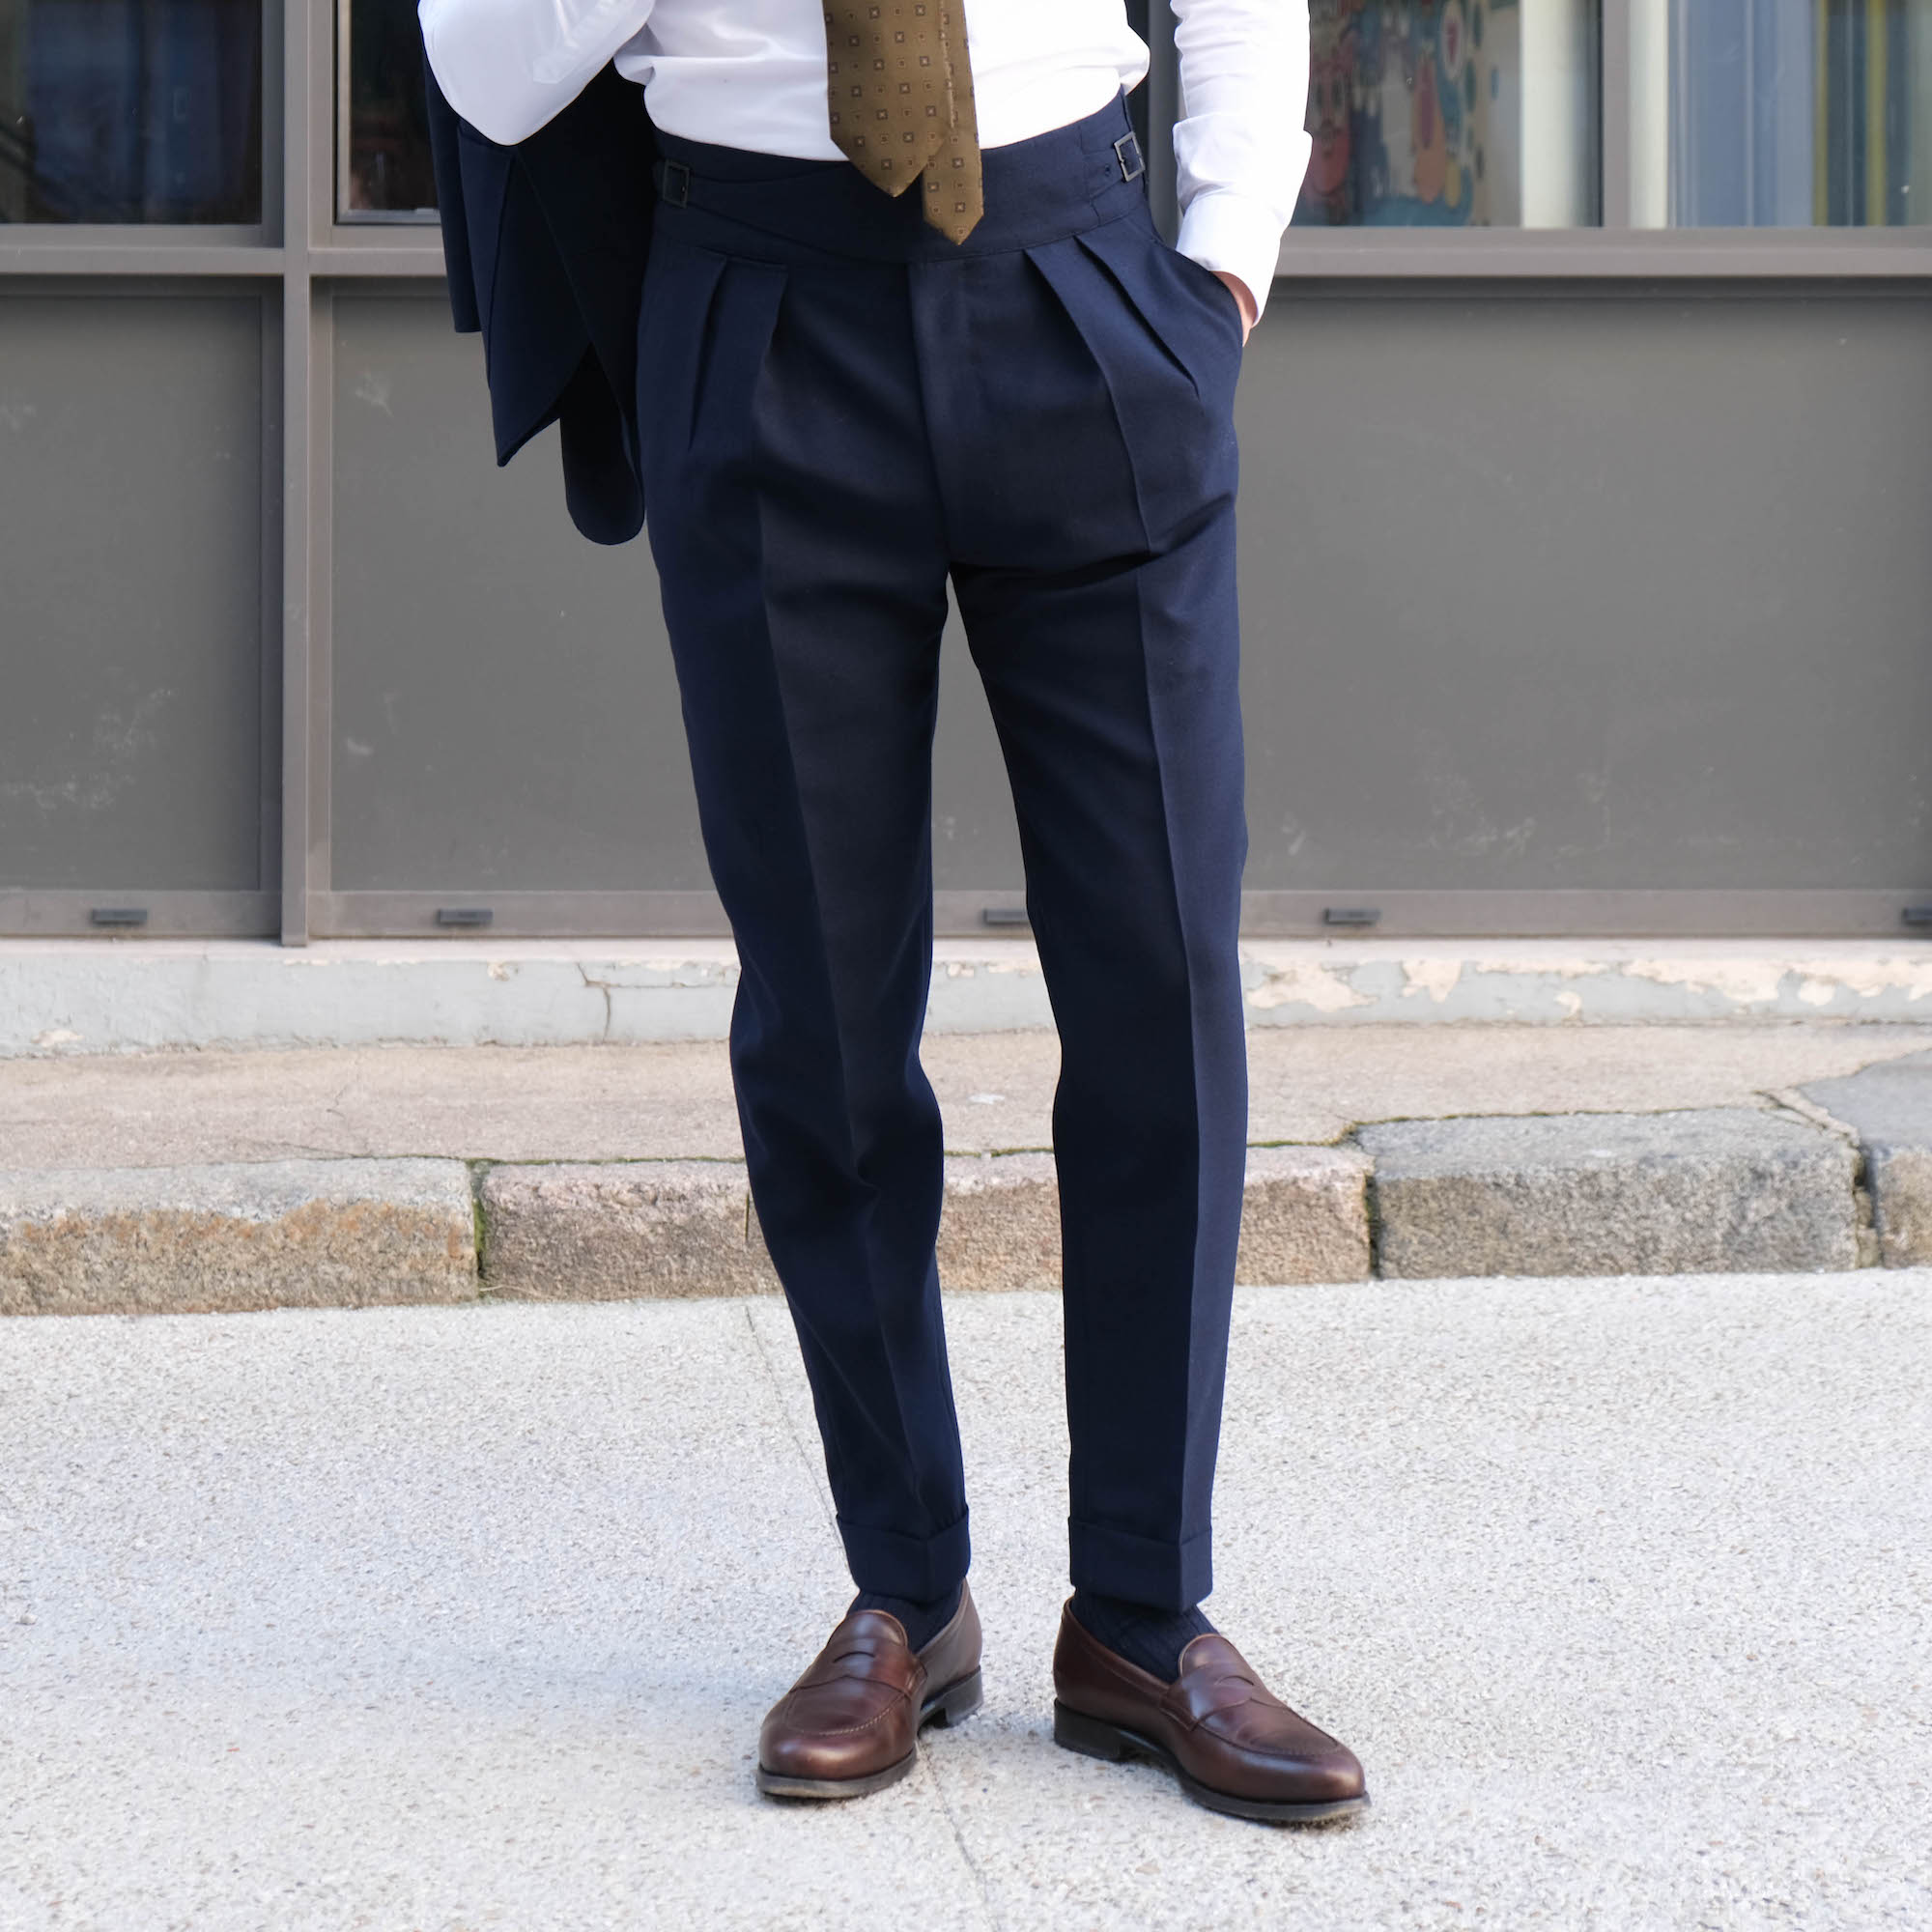 pantalon a pinces francaises